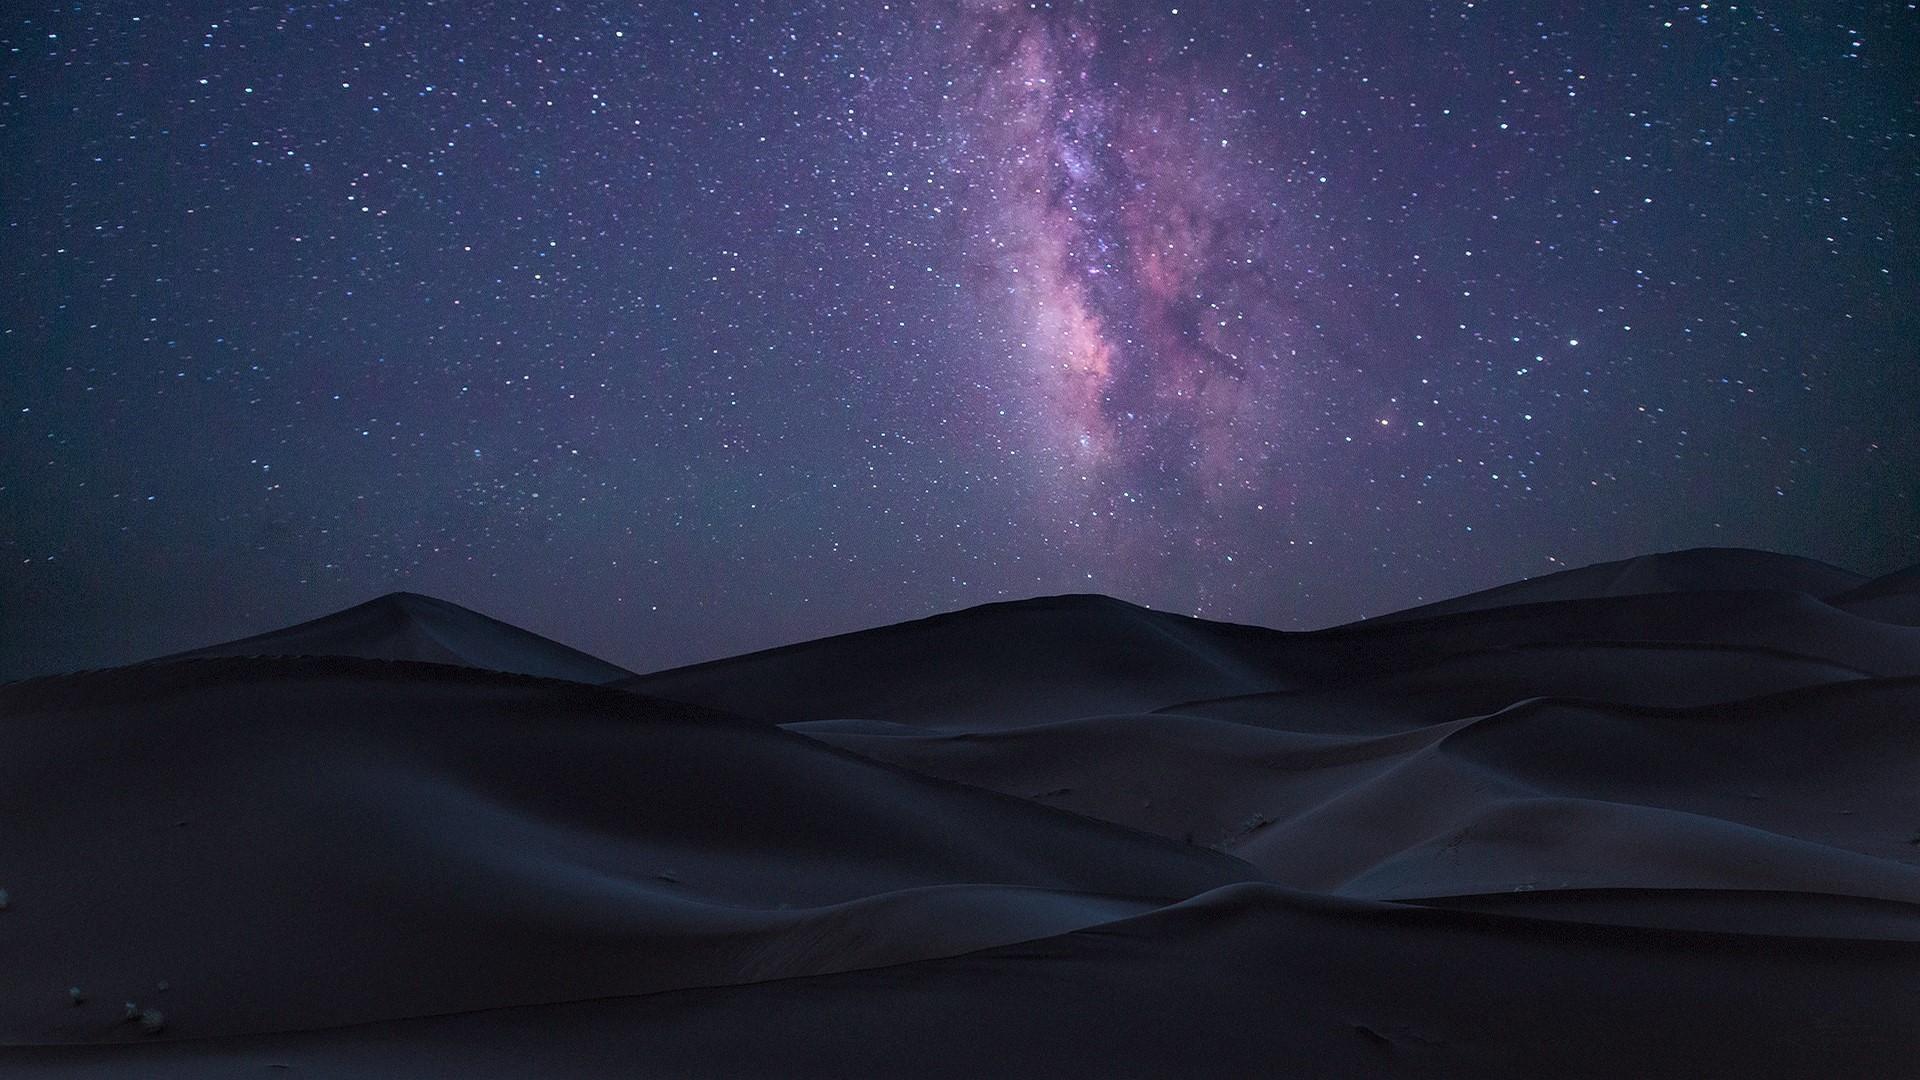 Starry Purple Night Sky, Full HD Wallpaper